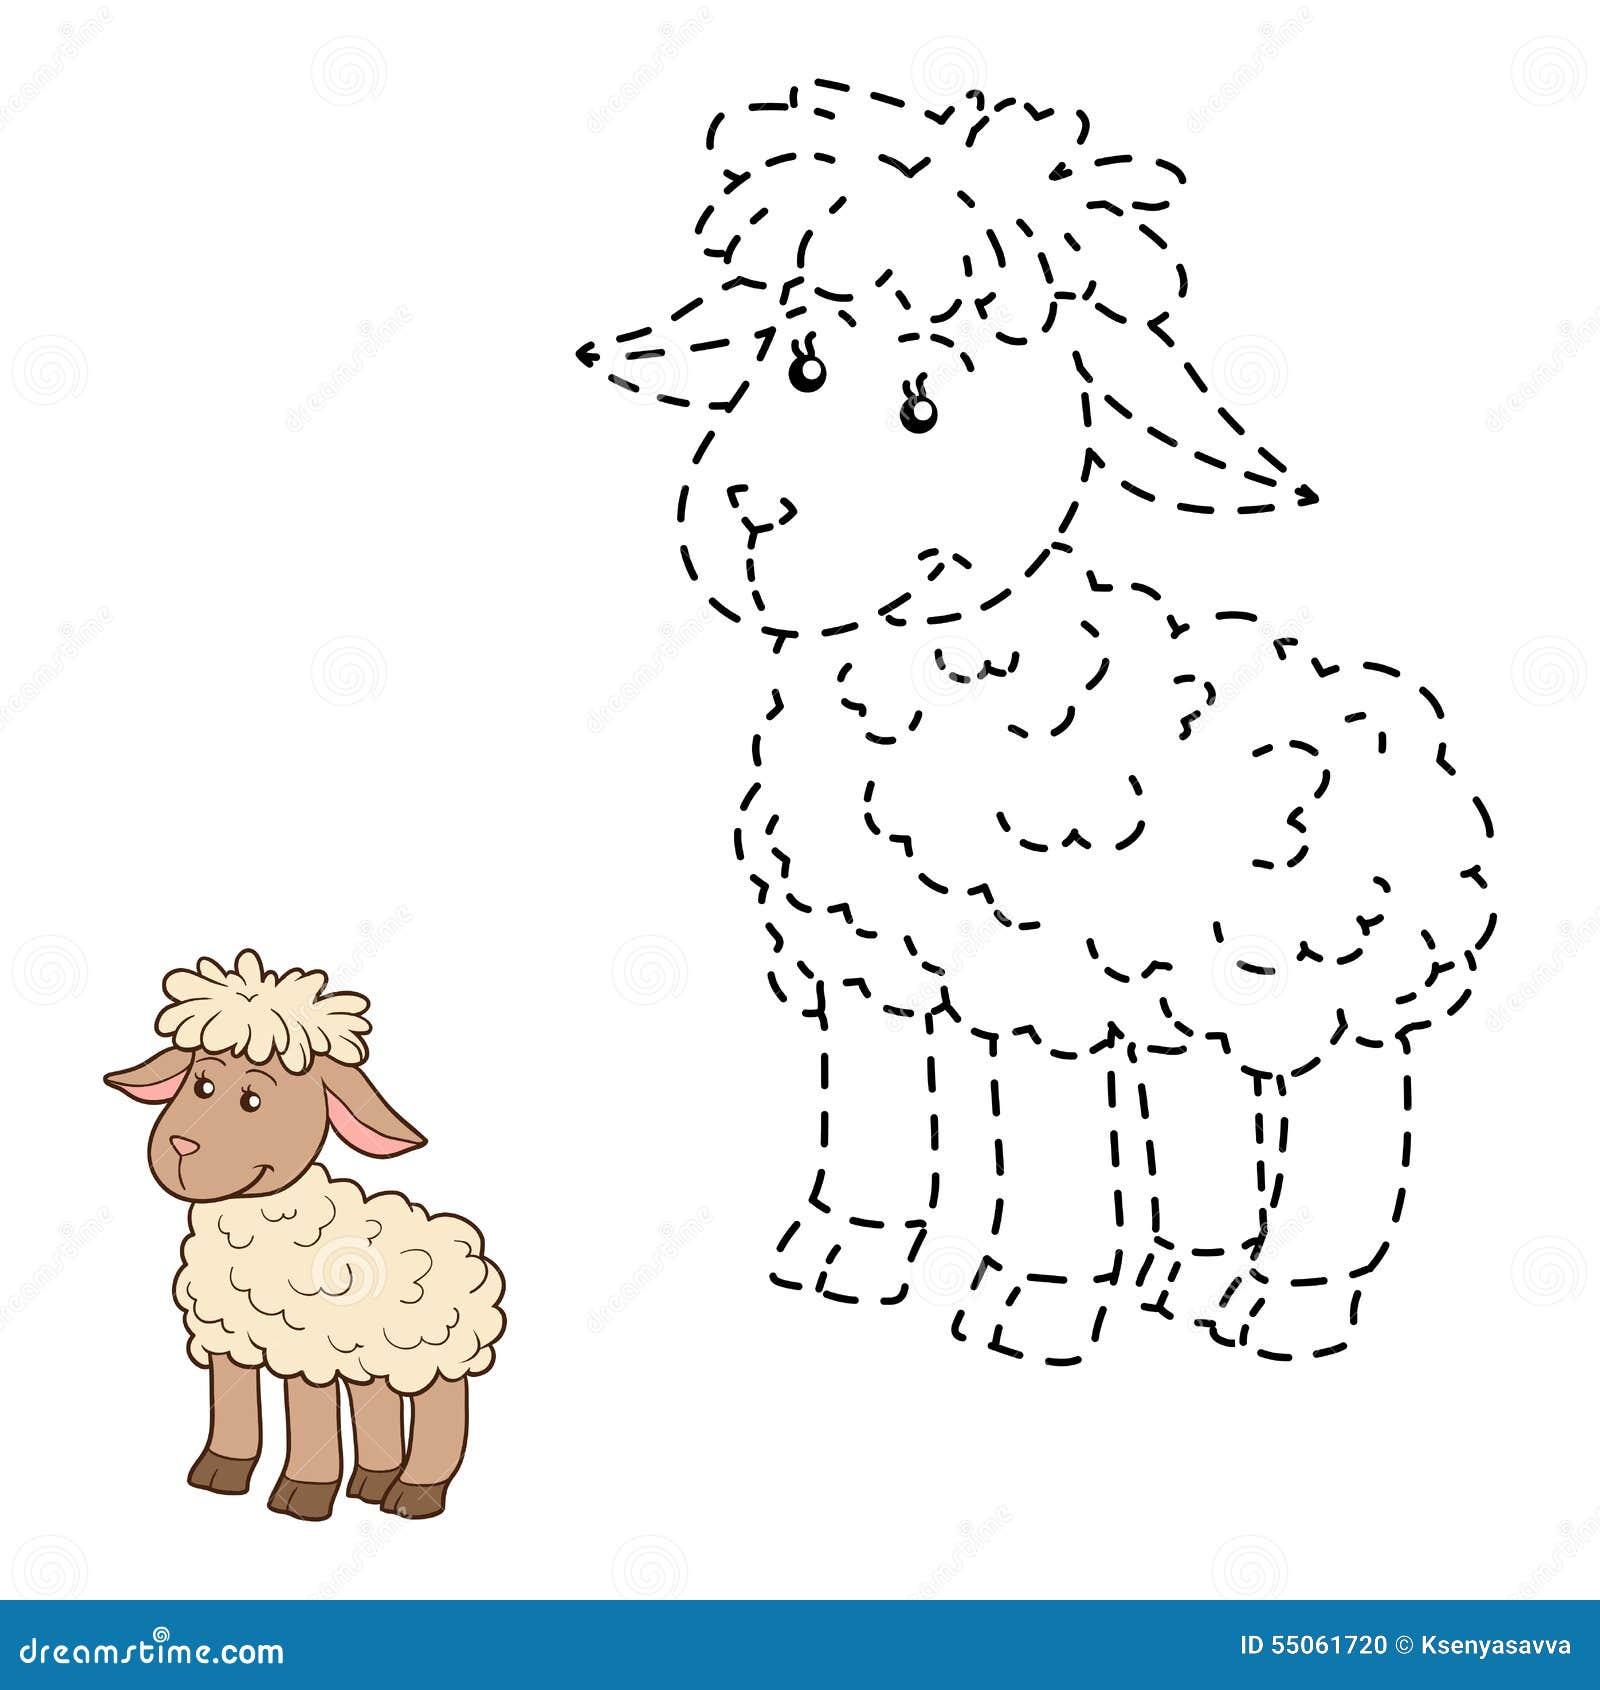 Colleghi i punti (pecore)